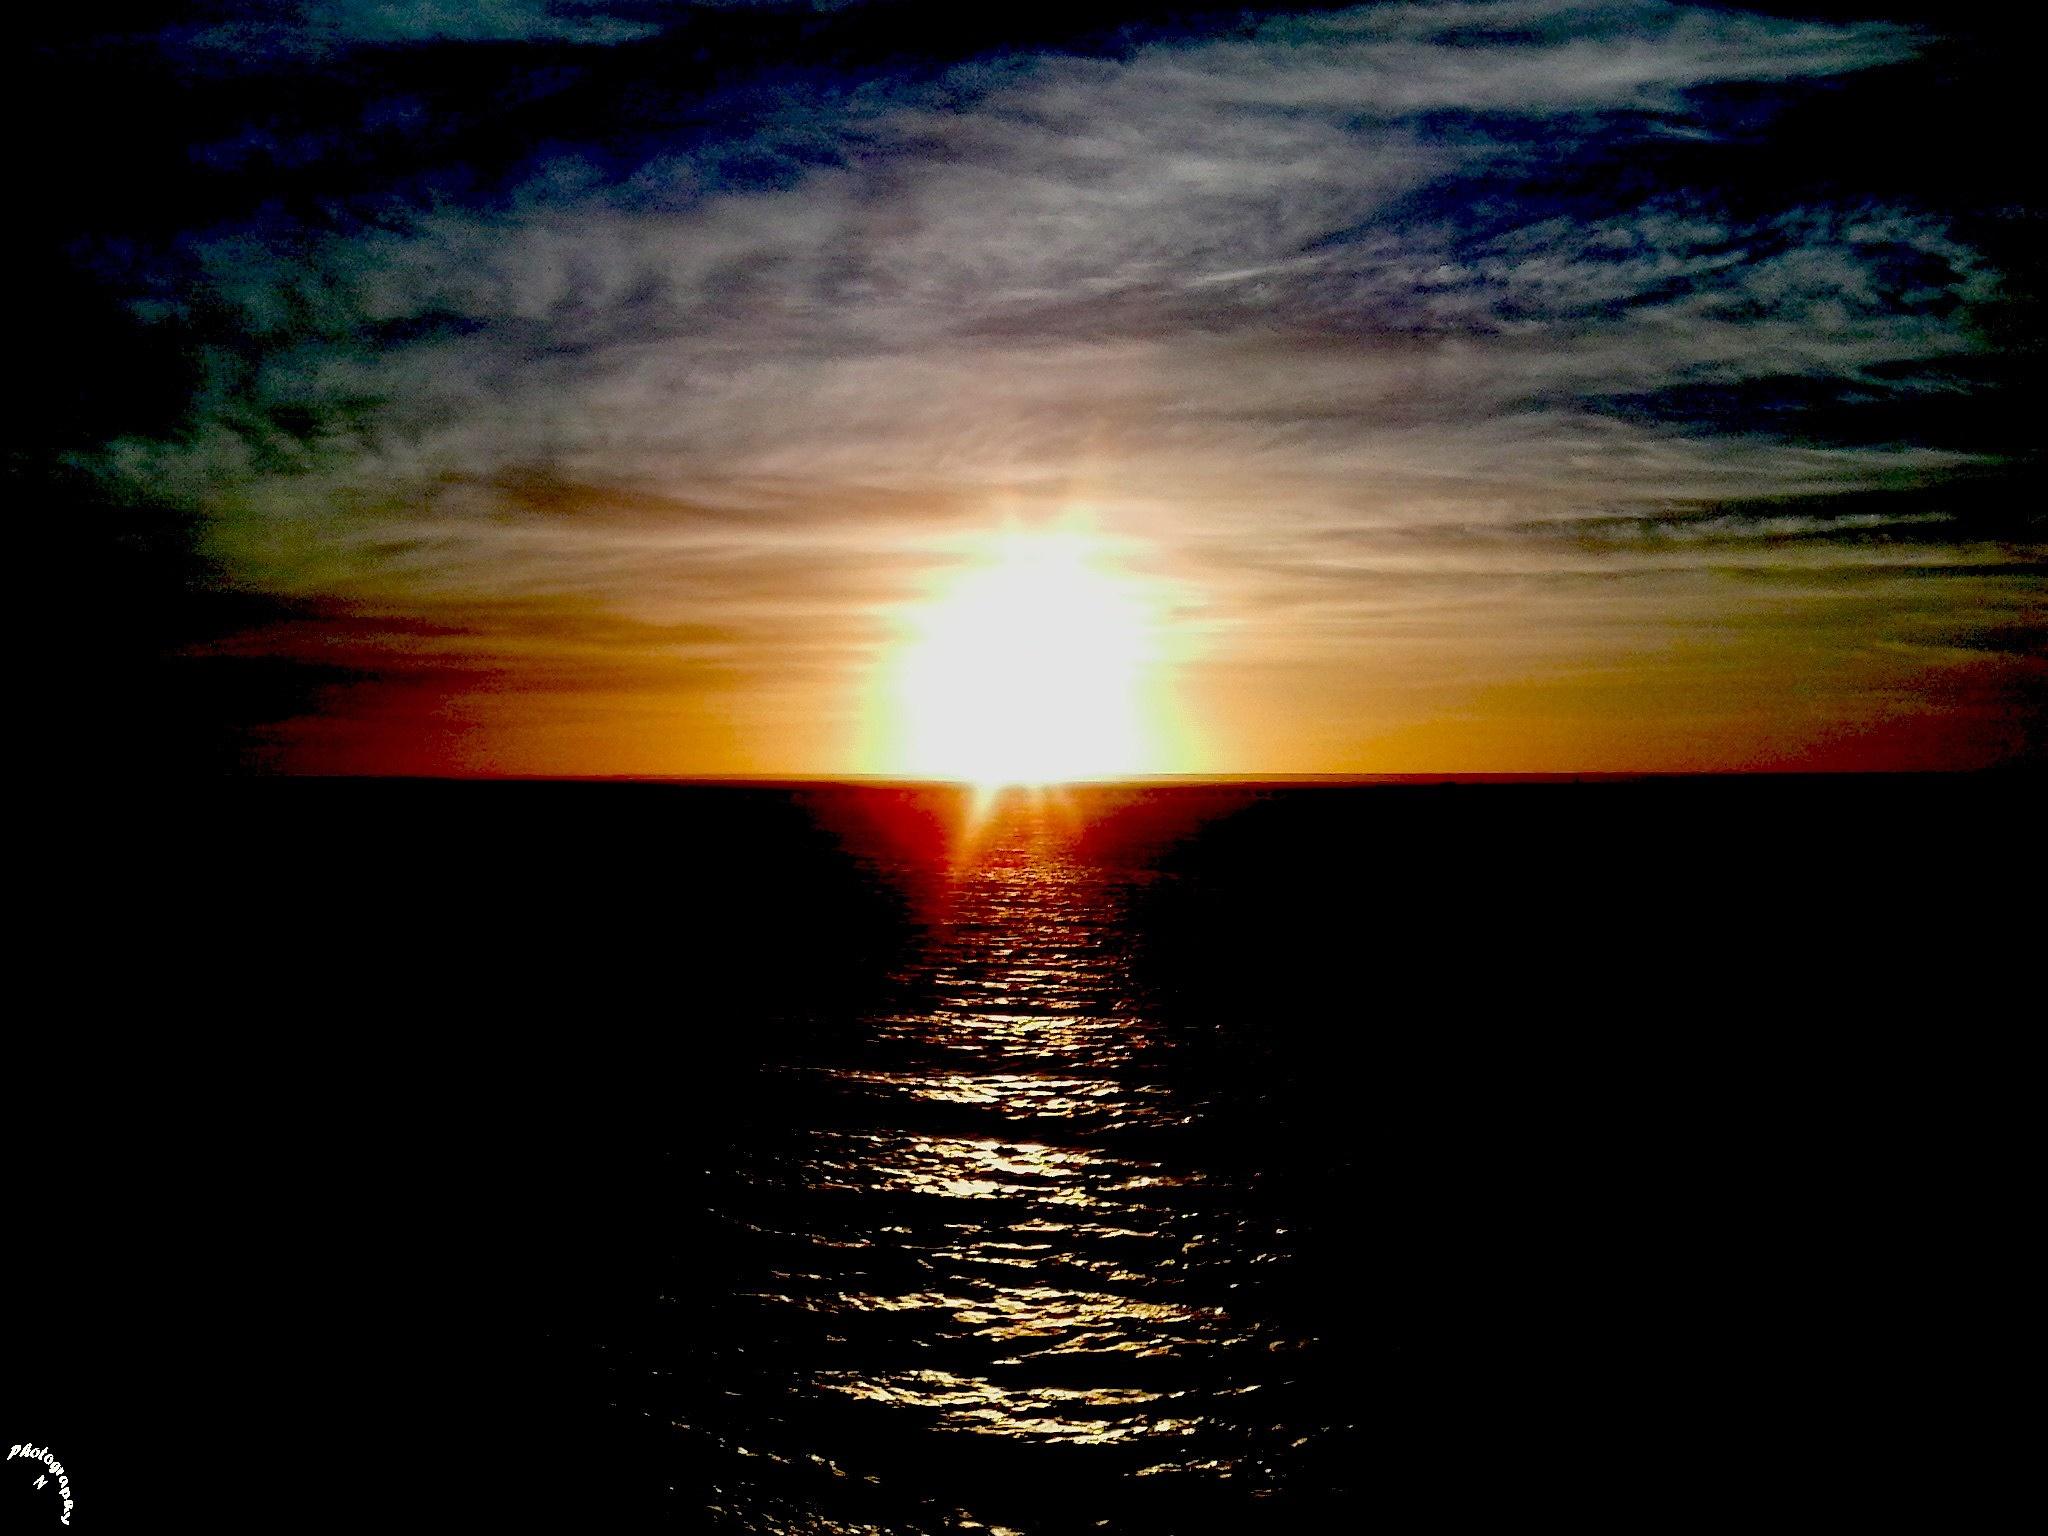 Sunset by nabeelnabil